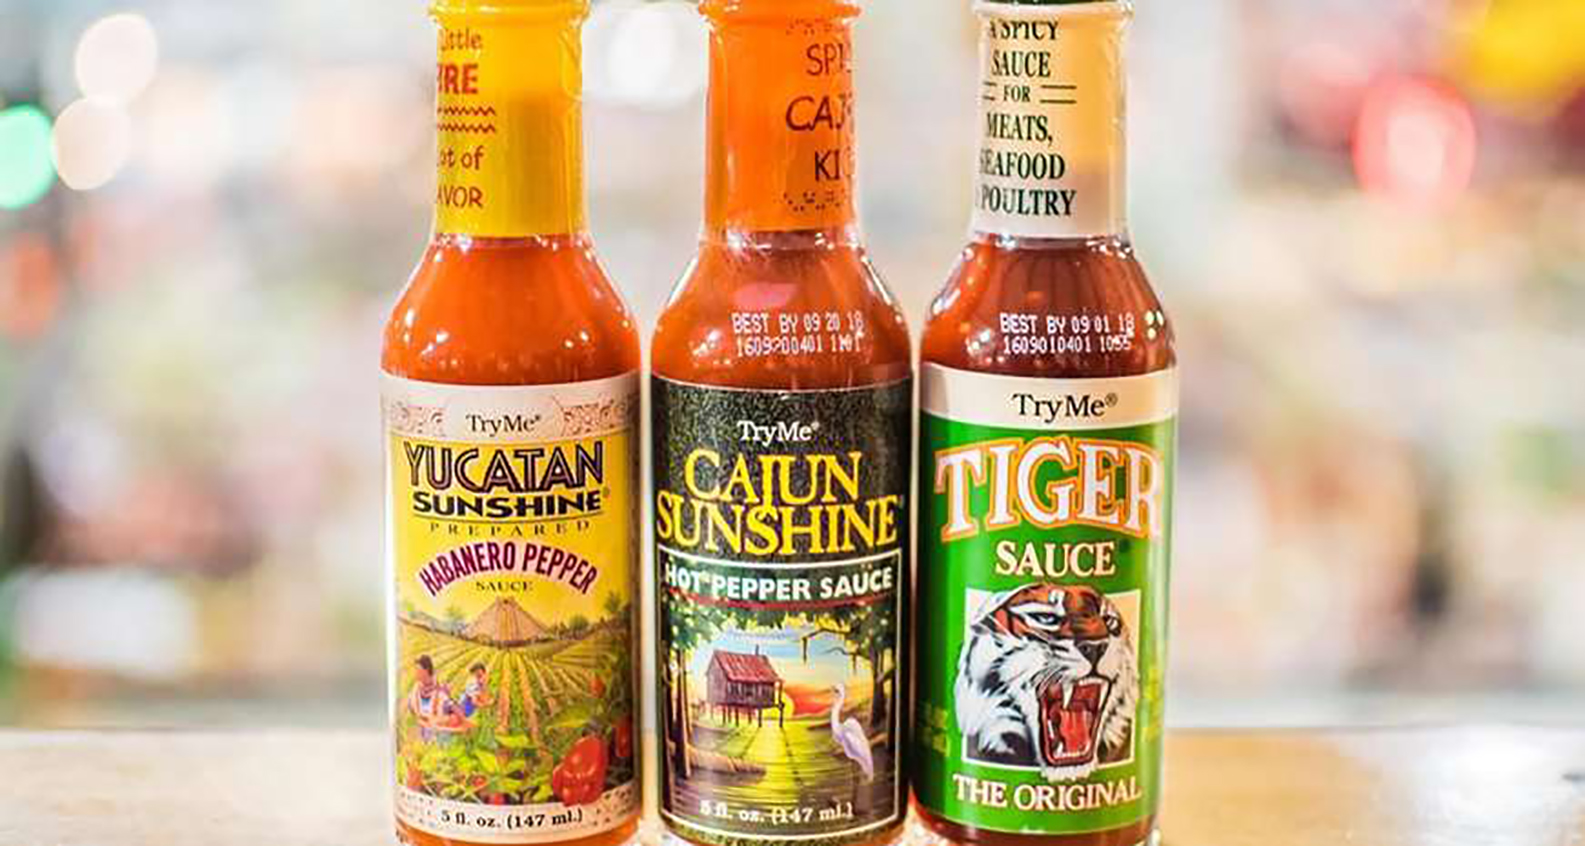 TryMe's Cajun Sunshine Hot Pepper Sauce